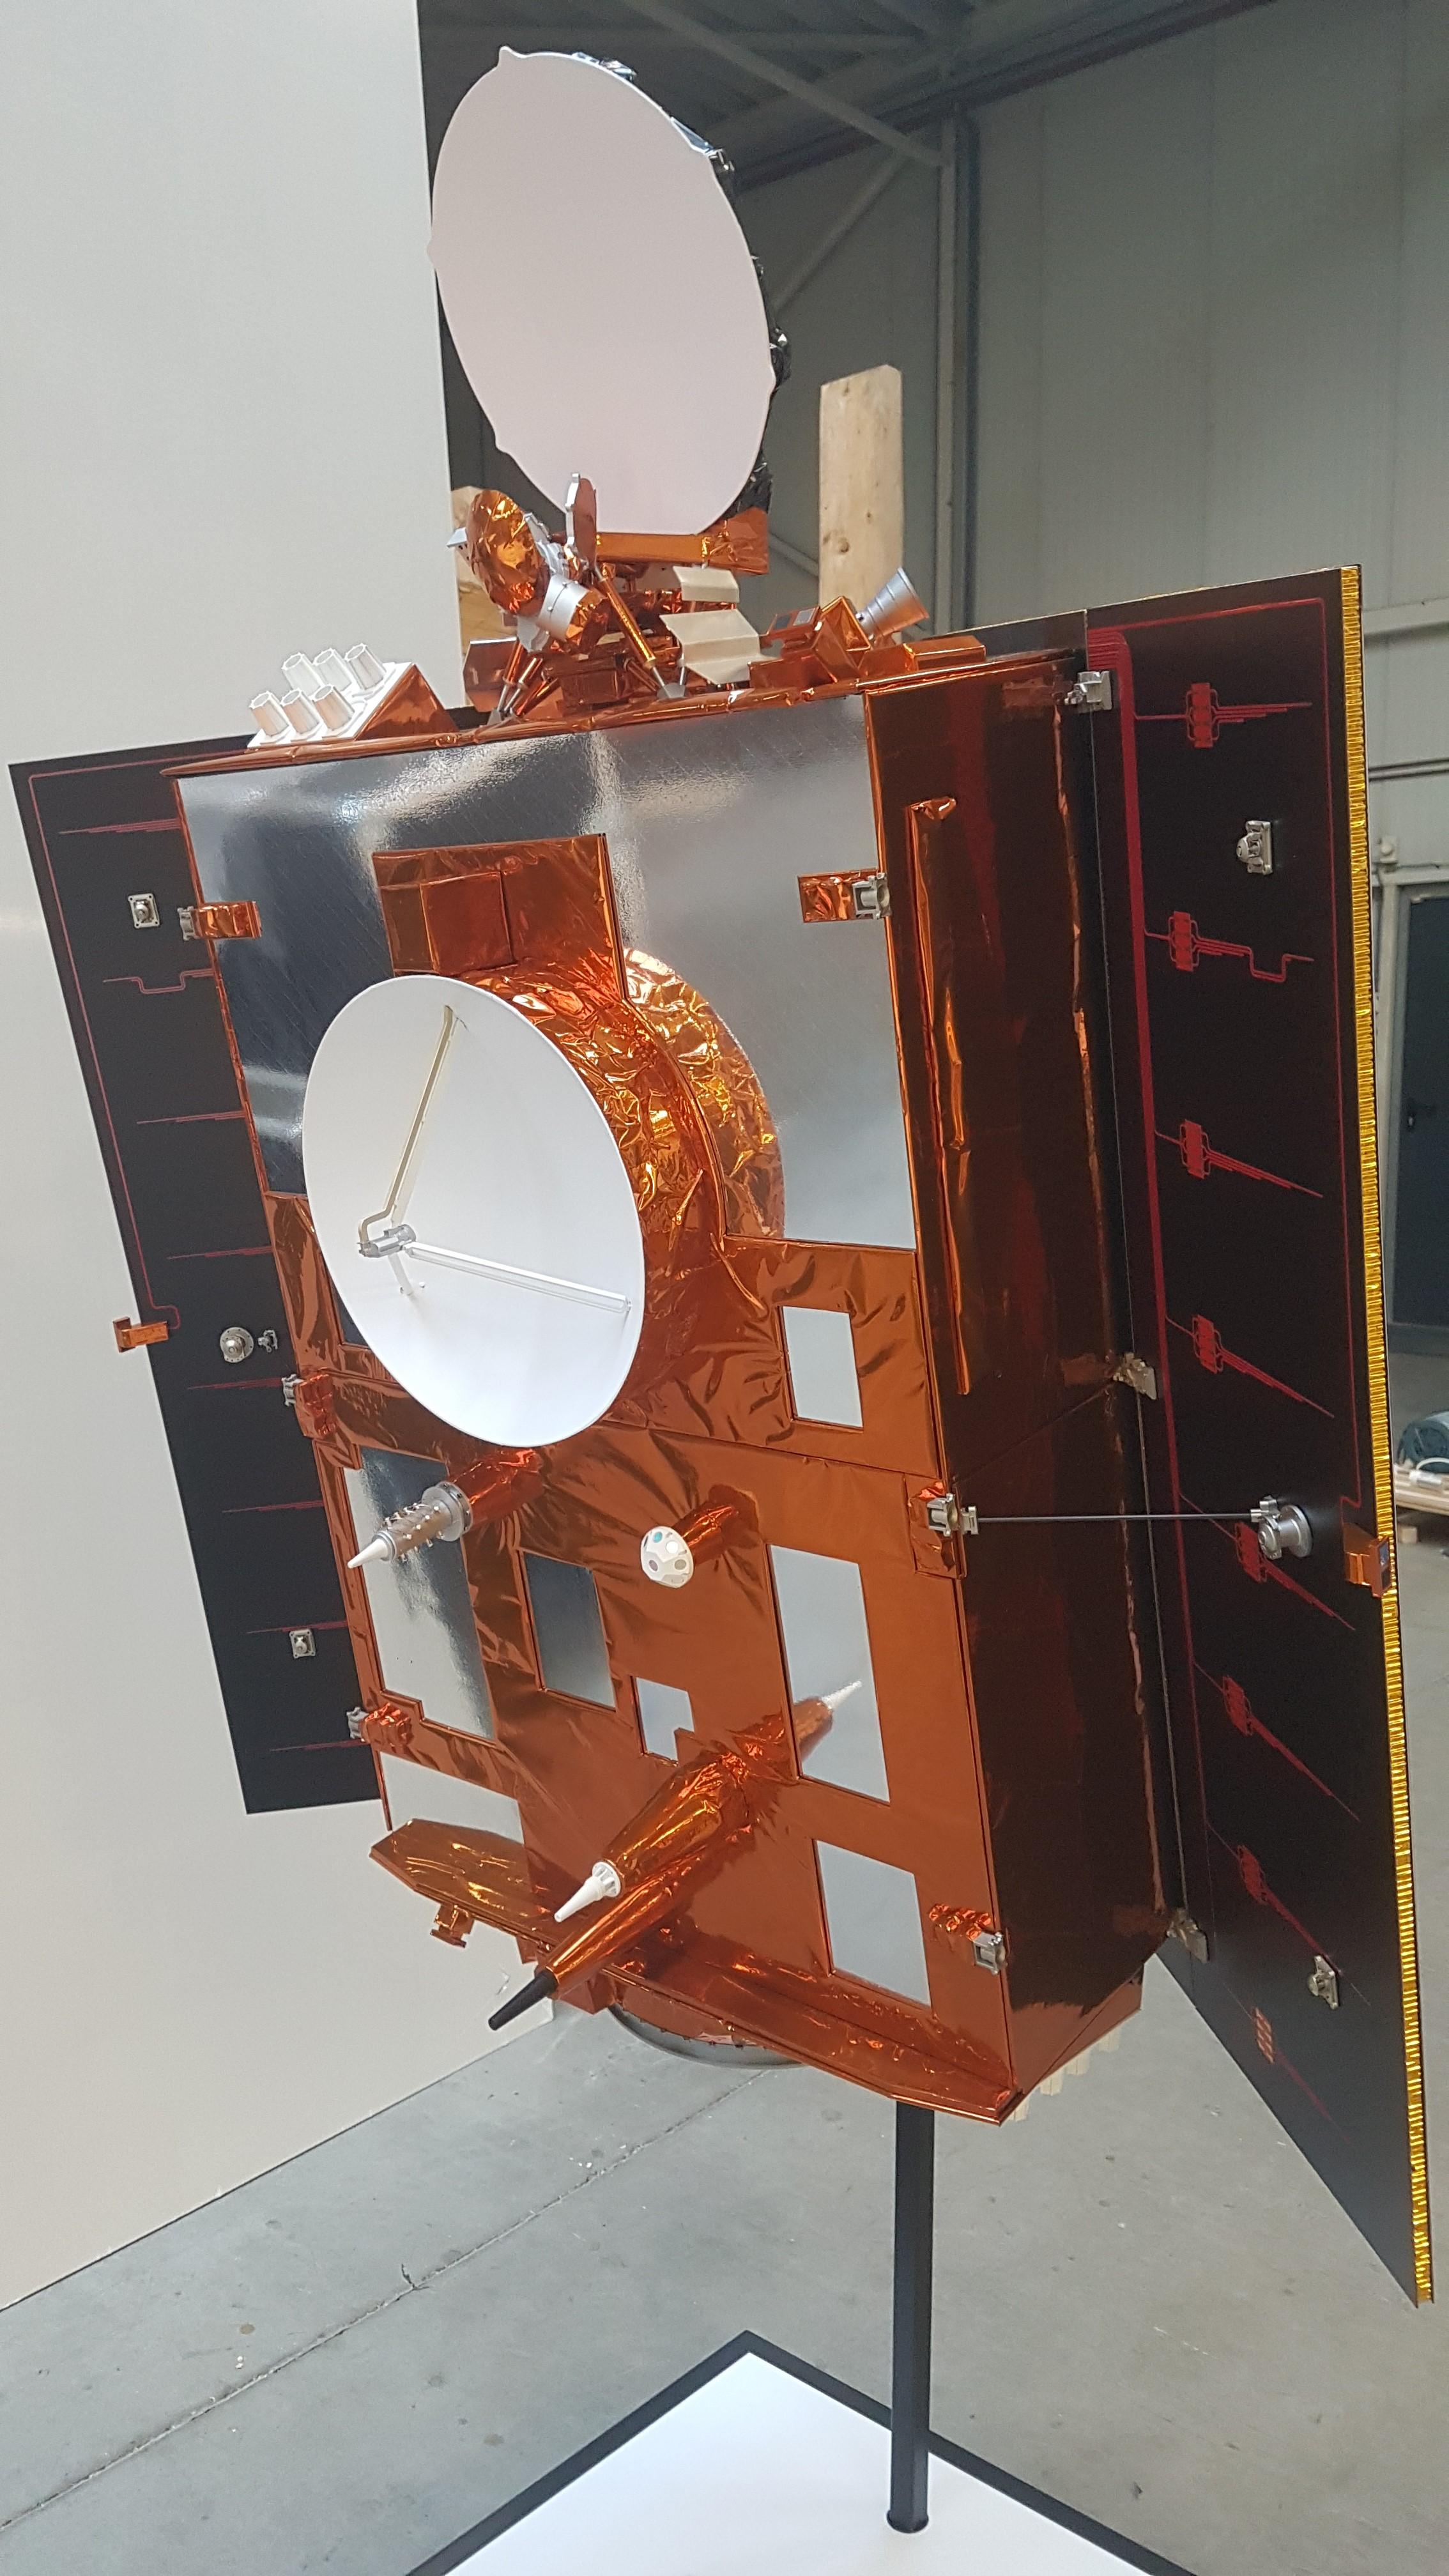 Sentinel-6 1:4 space model satellite